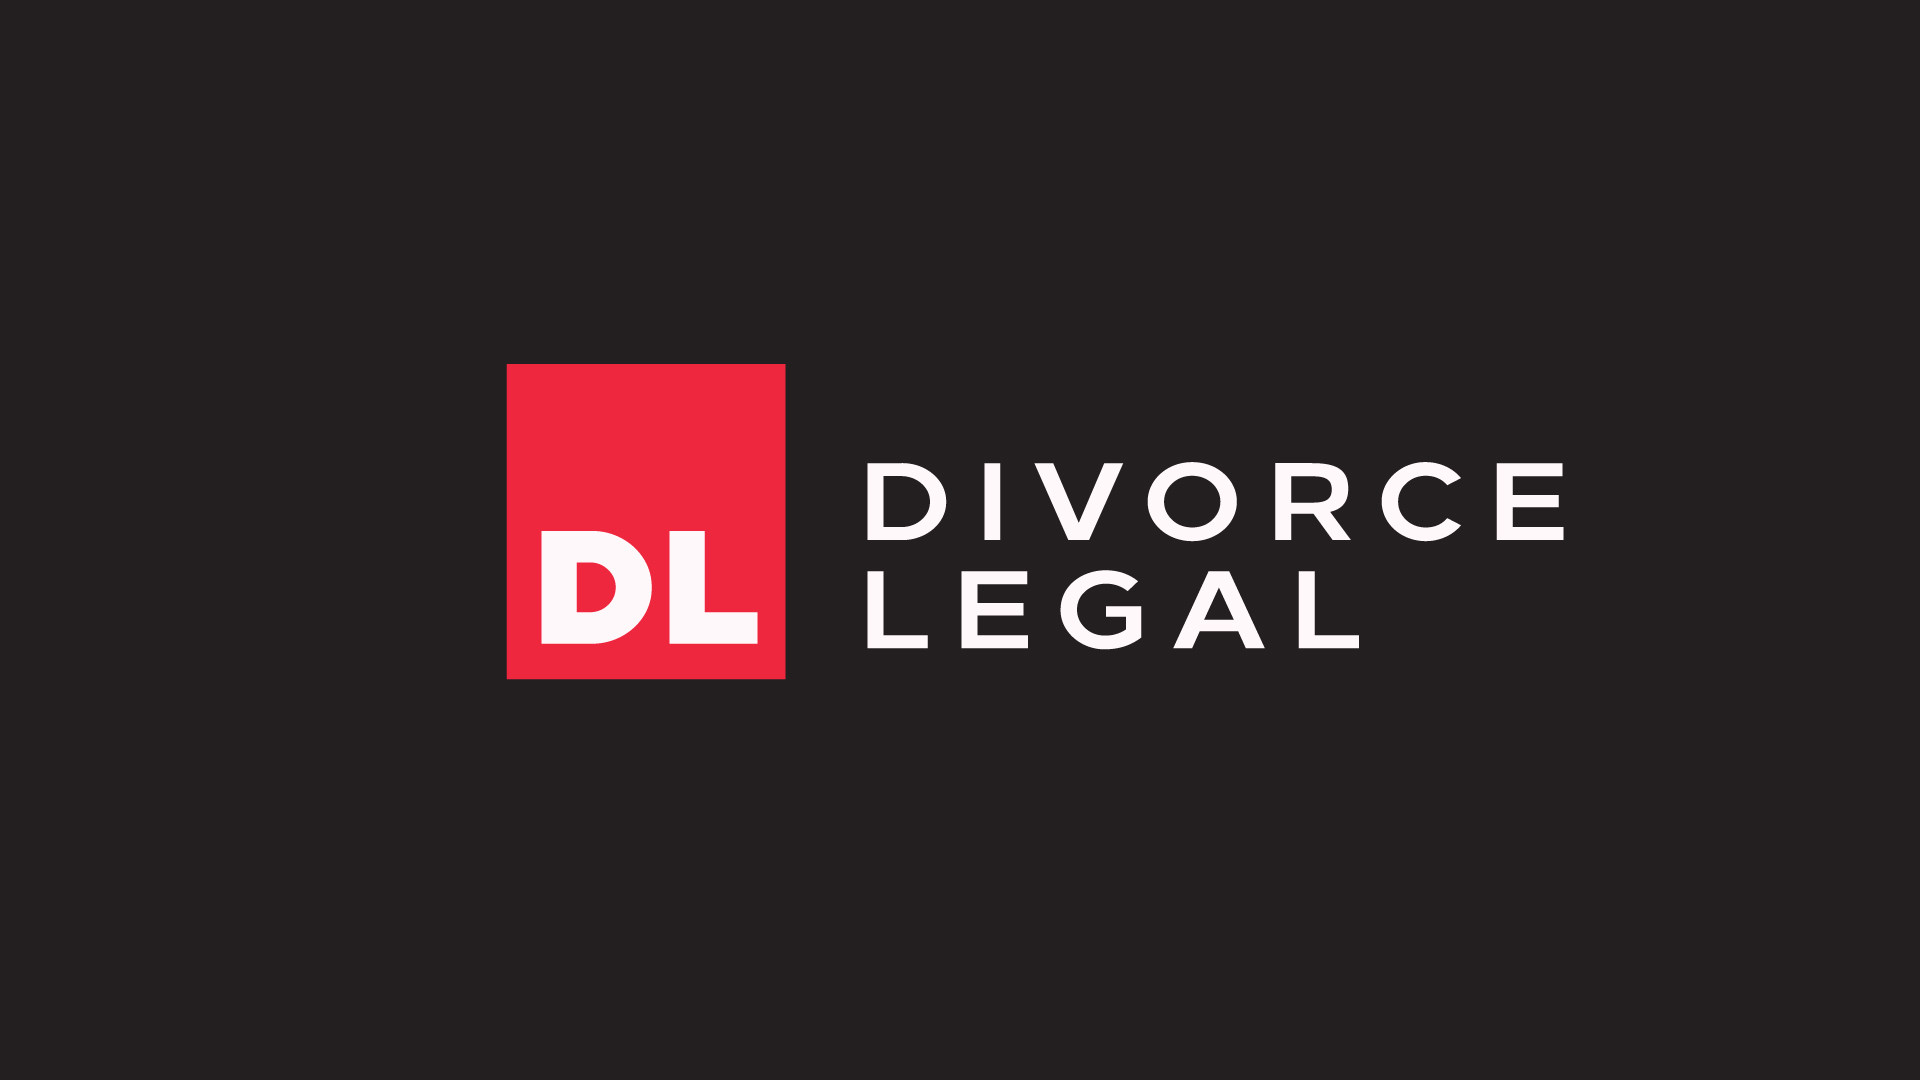 Divorce-legal-logo20-dark.jpg